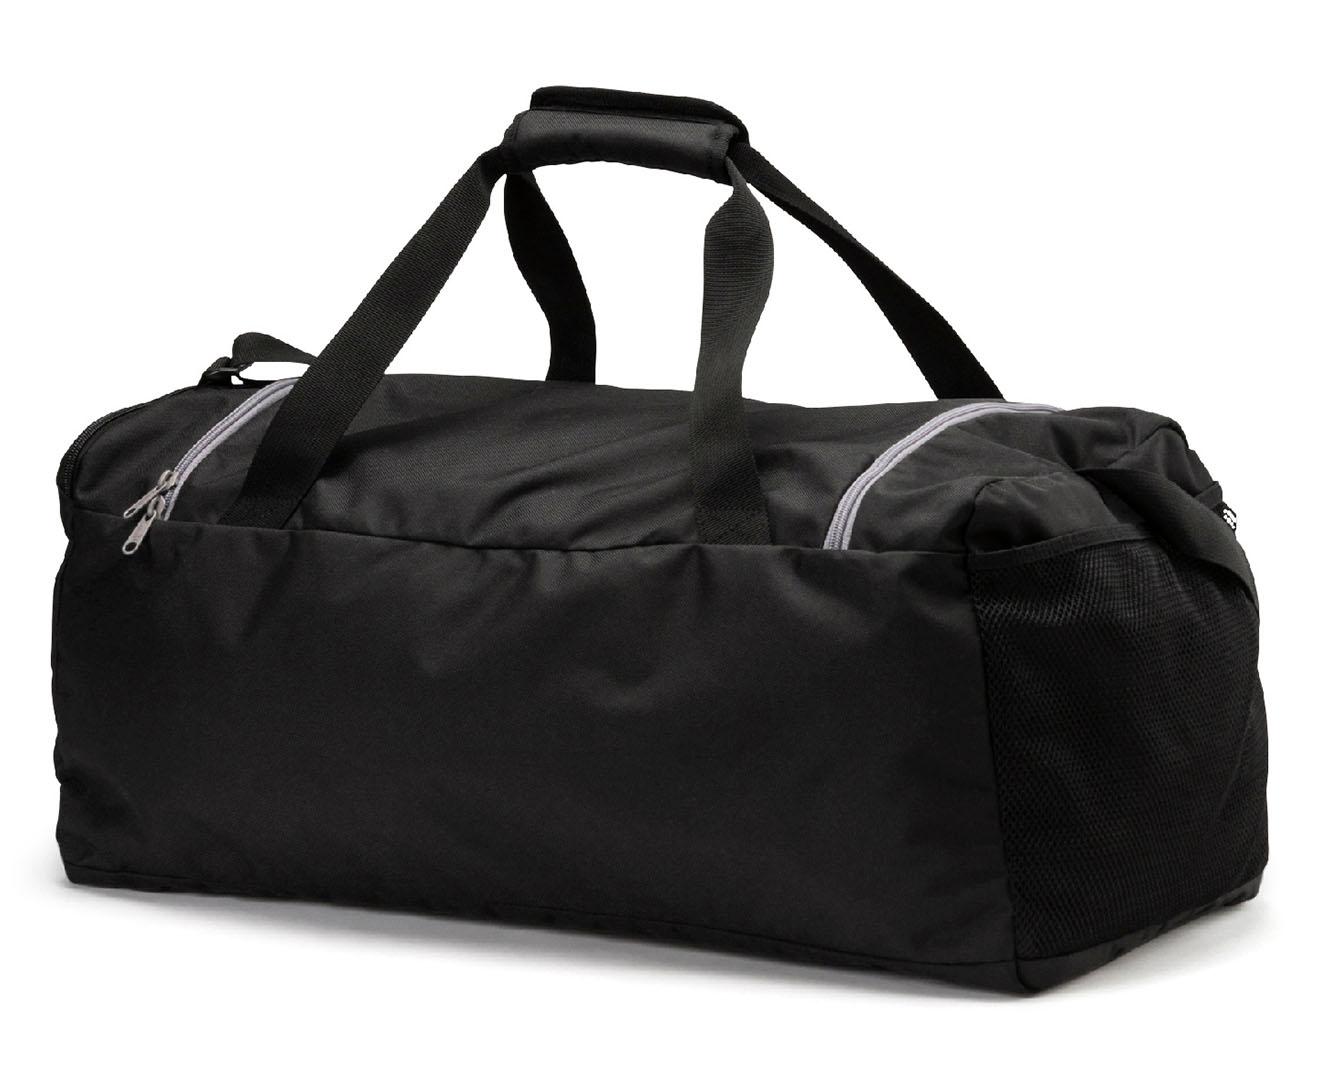 e1913c5b337f Puma Medium Fundamentals Sports Bag - Puma Black 4059506128356